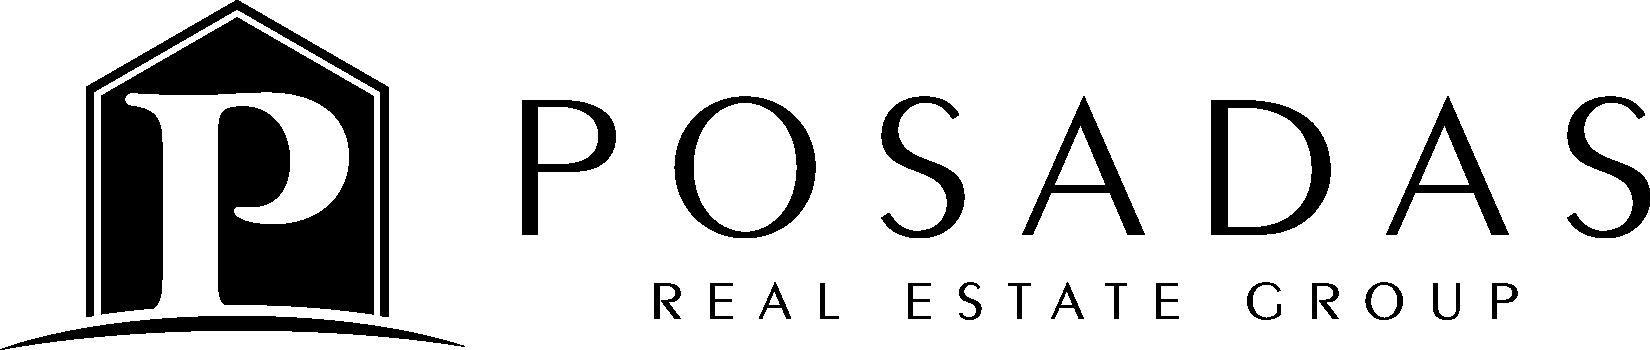 Posadas Real Estate Group